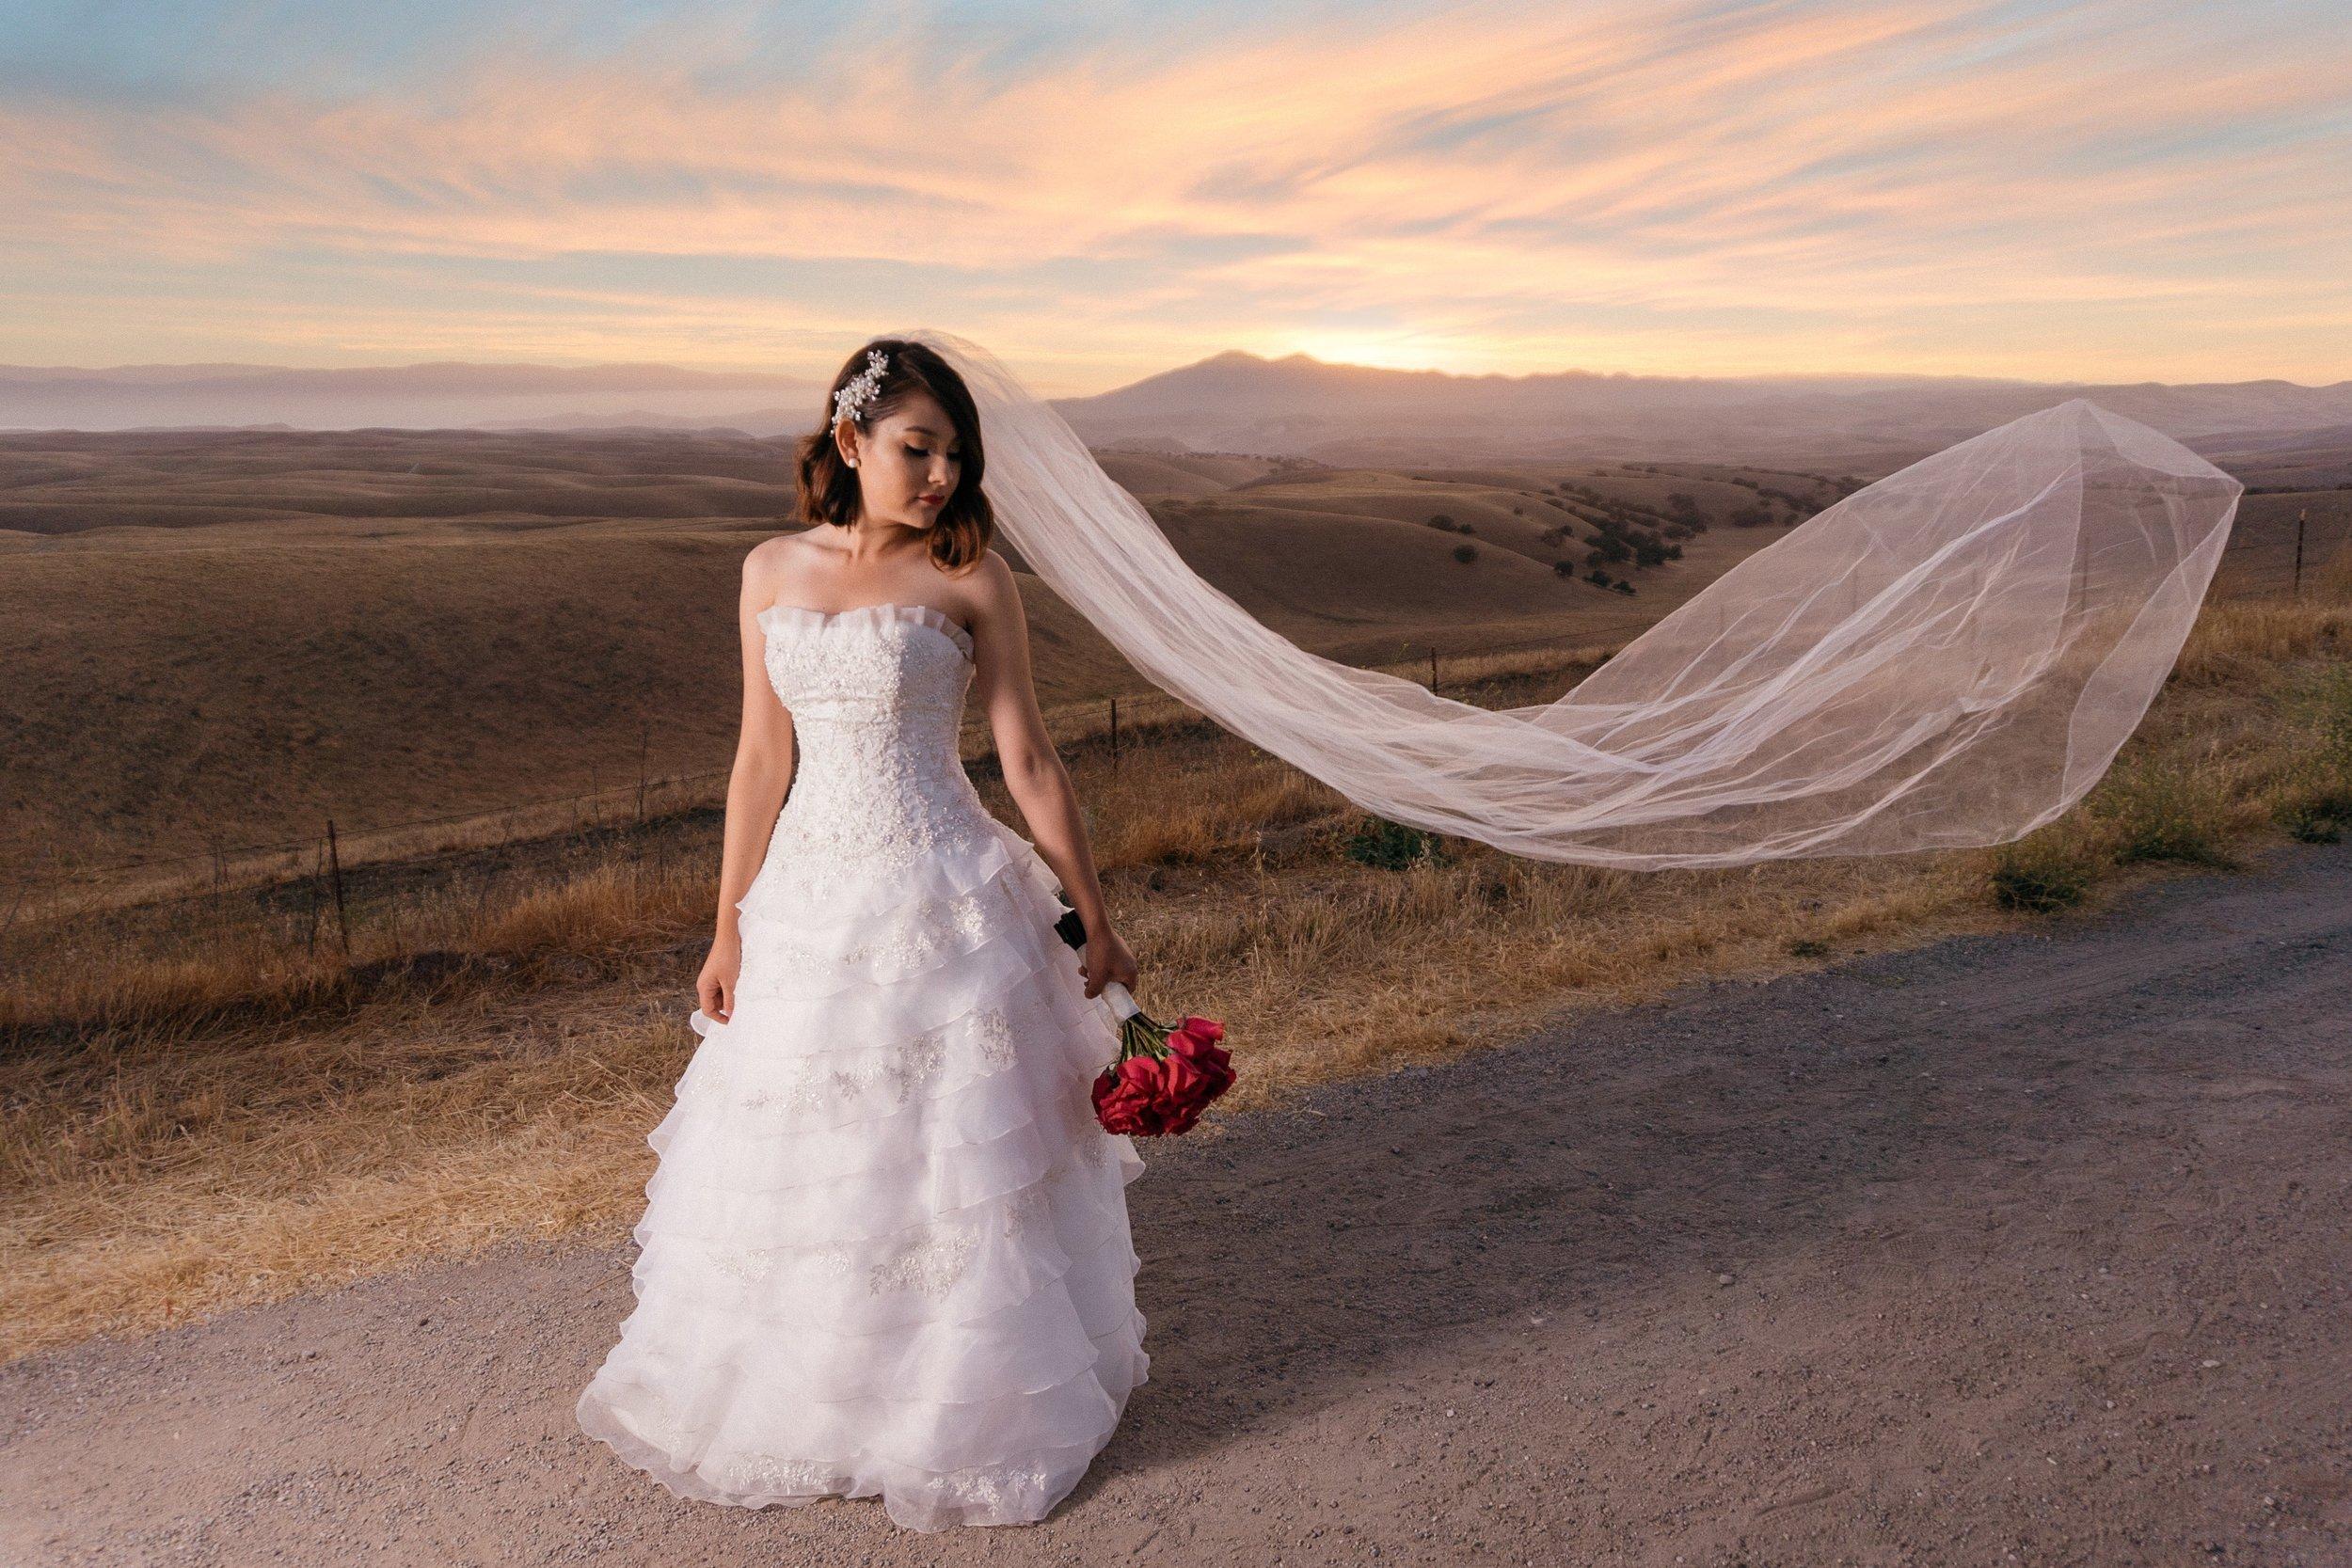 monterey-wedding-photographer-dramatic-sky-bride-.jpg